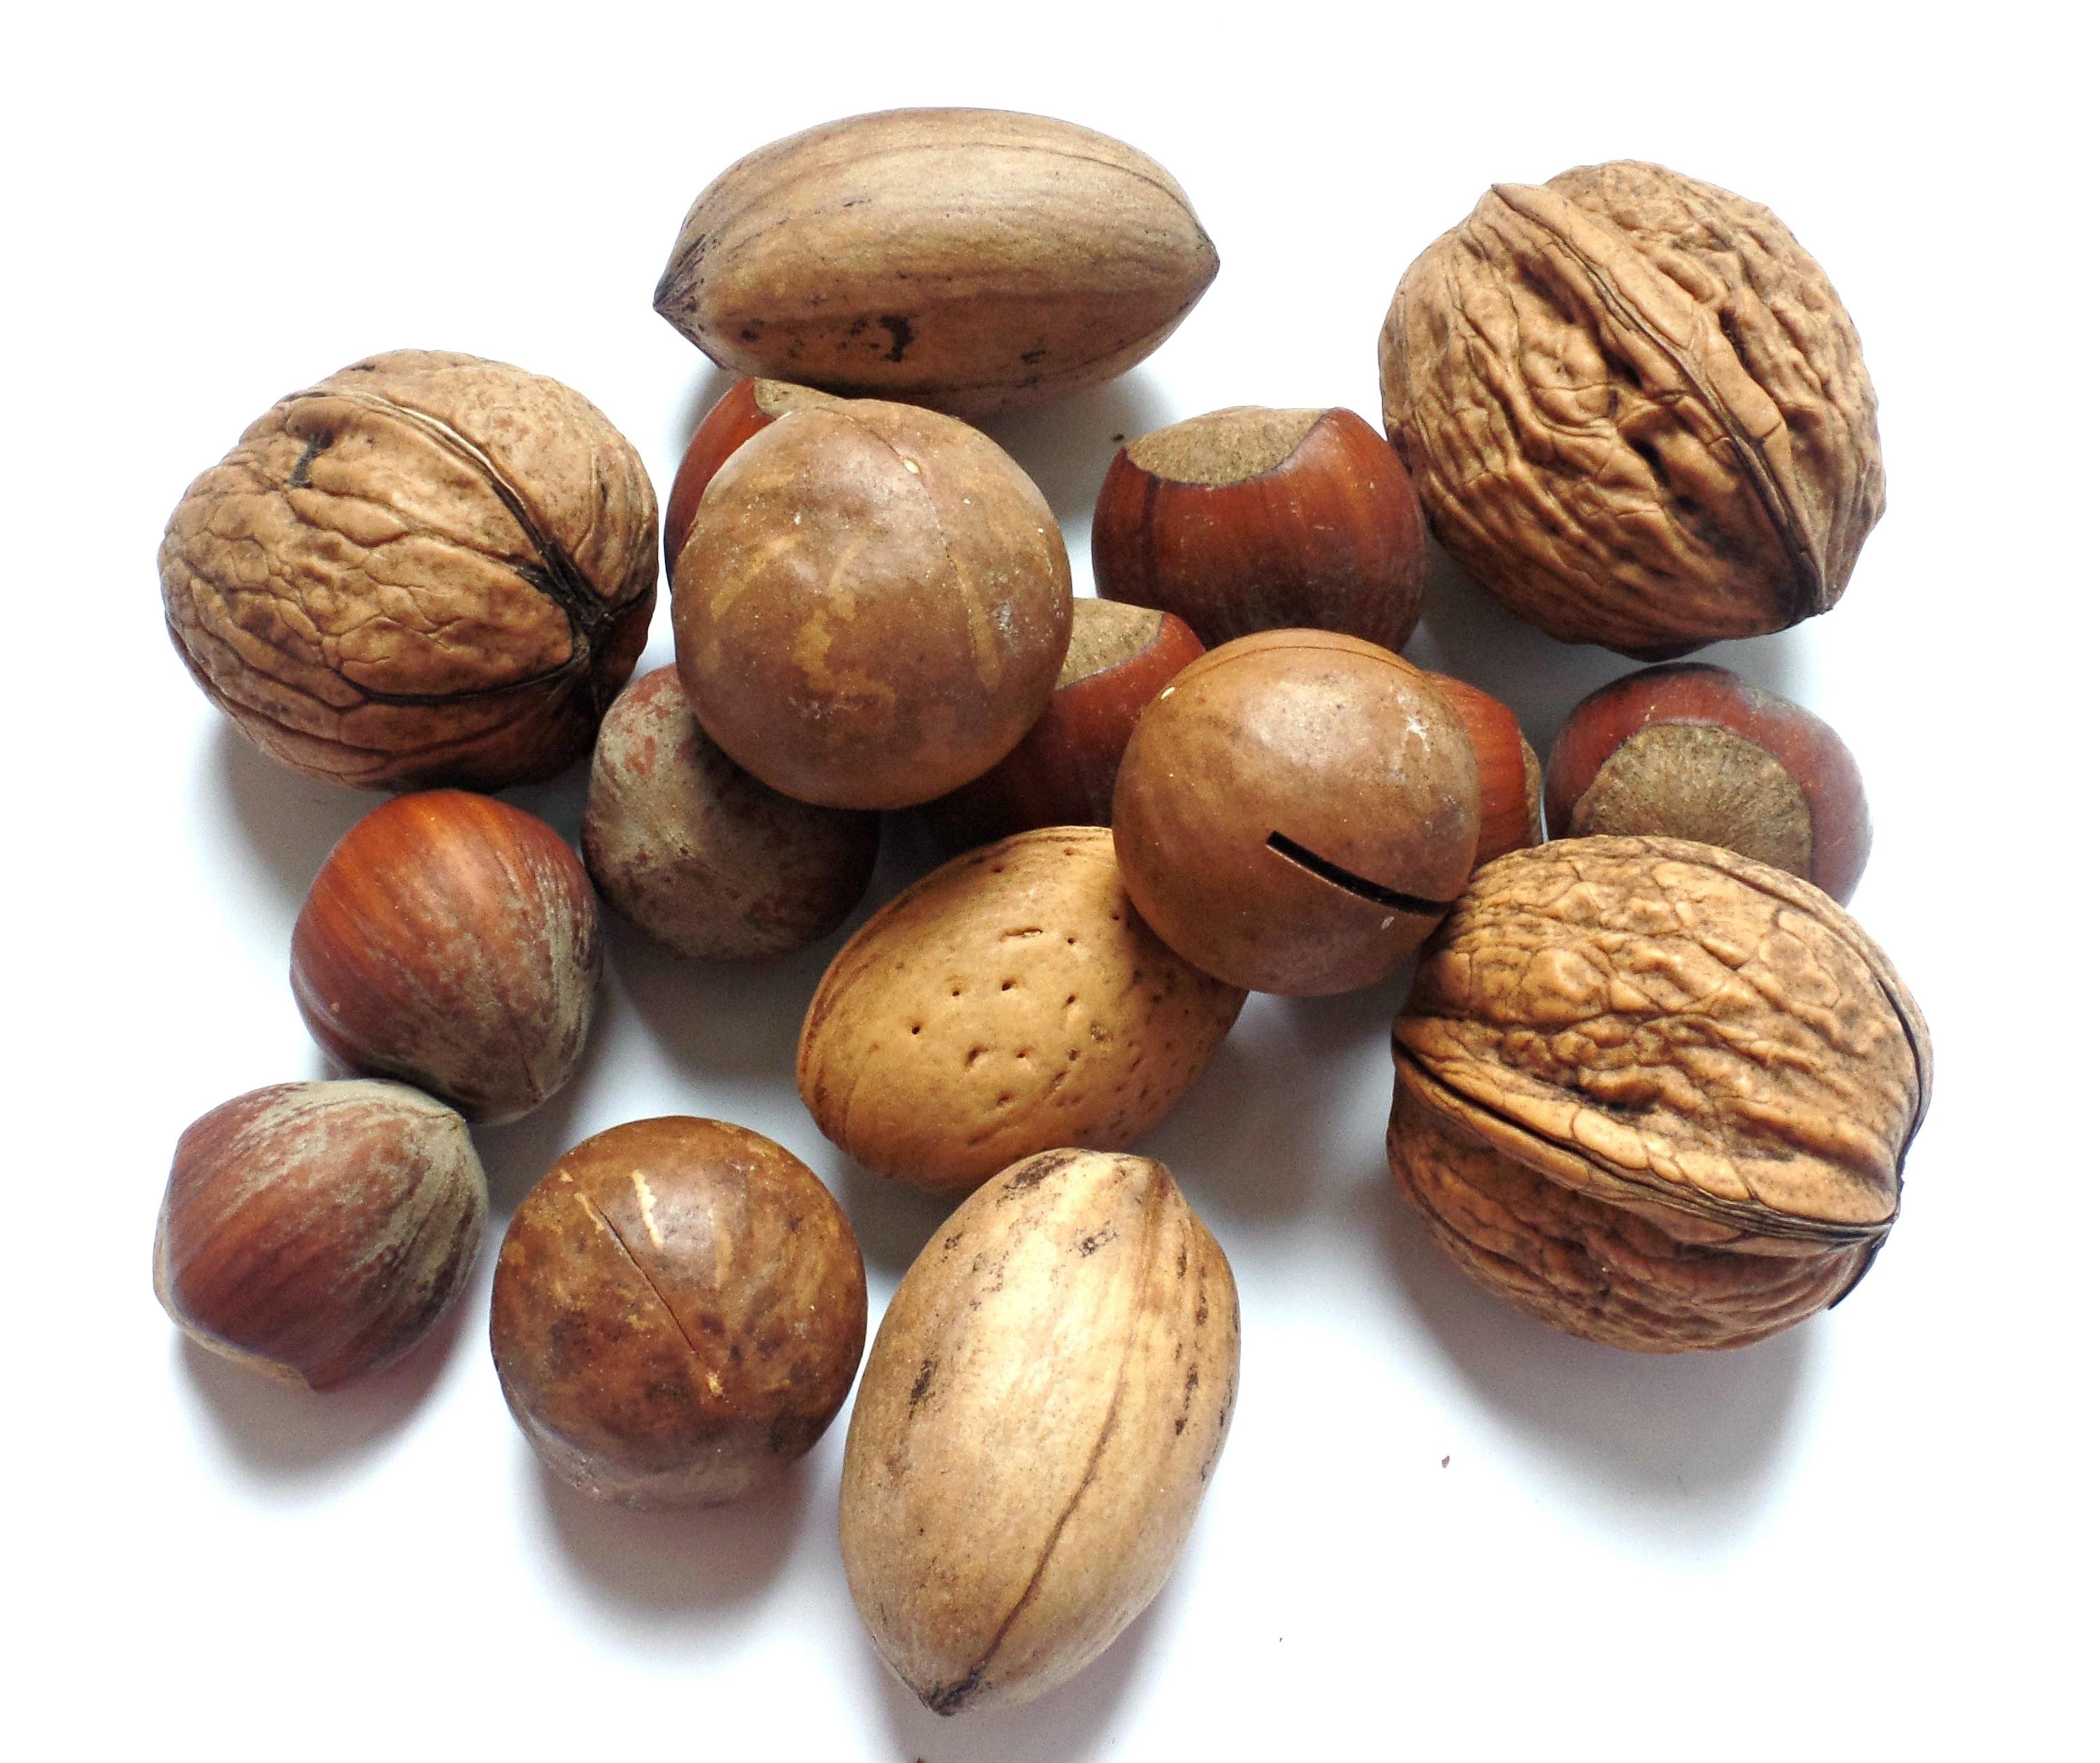 assorted nut lot free image | Peakpx